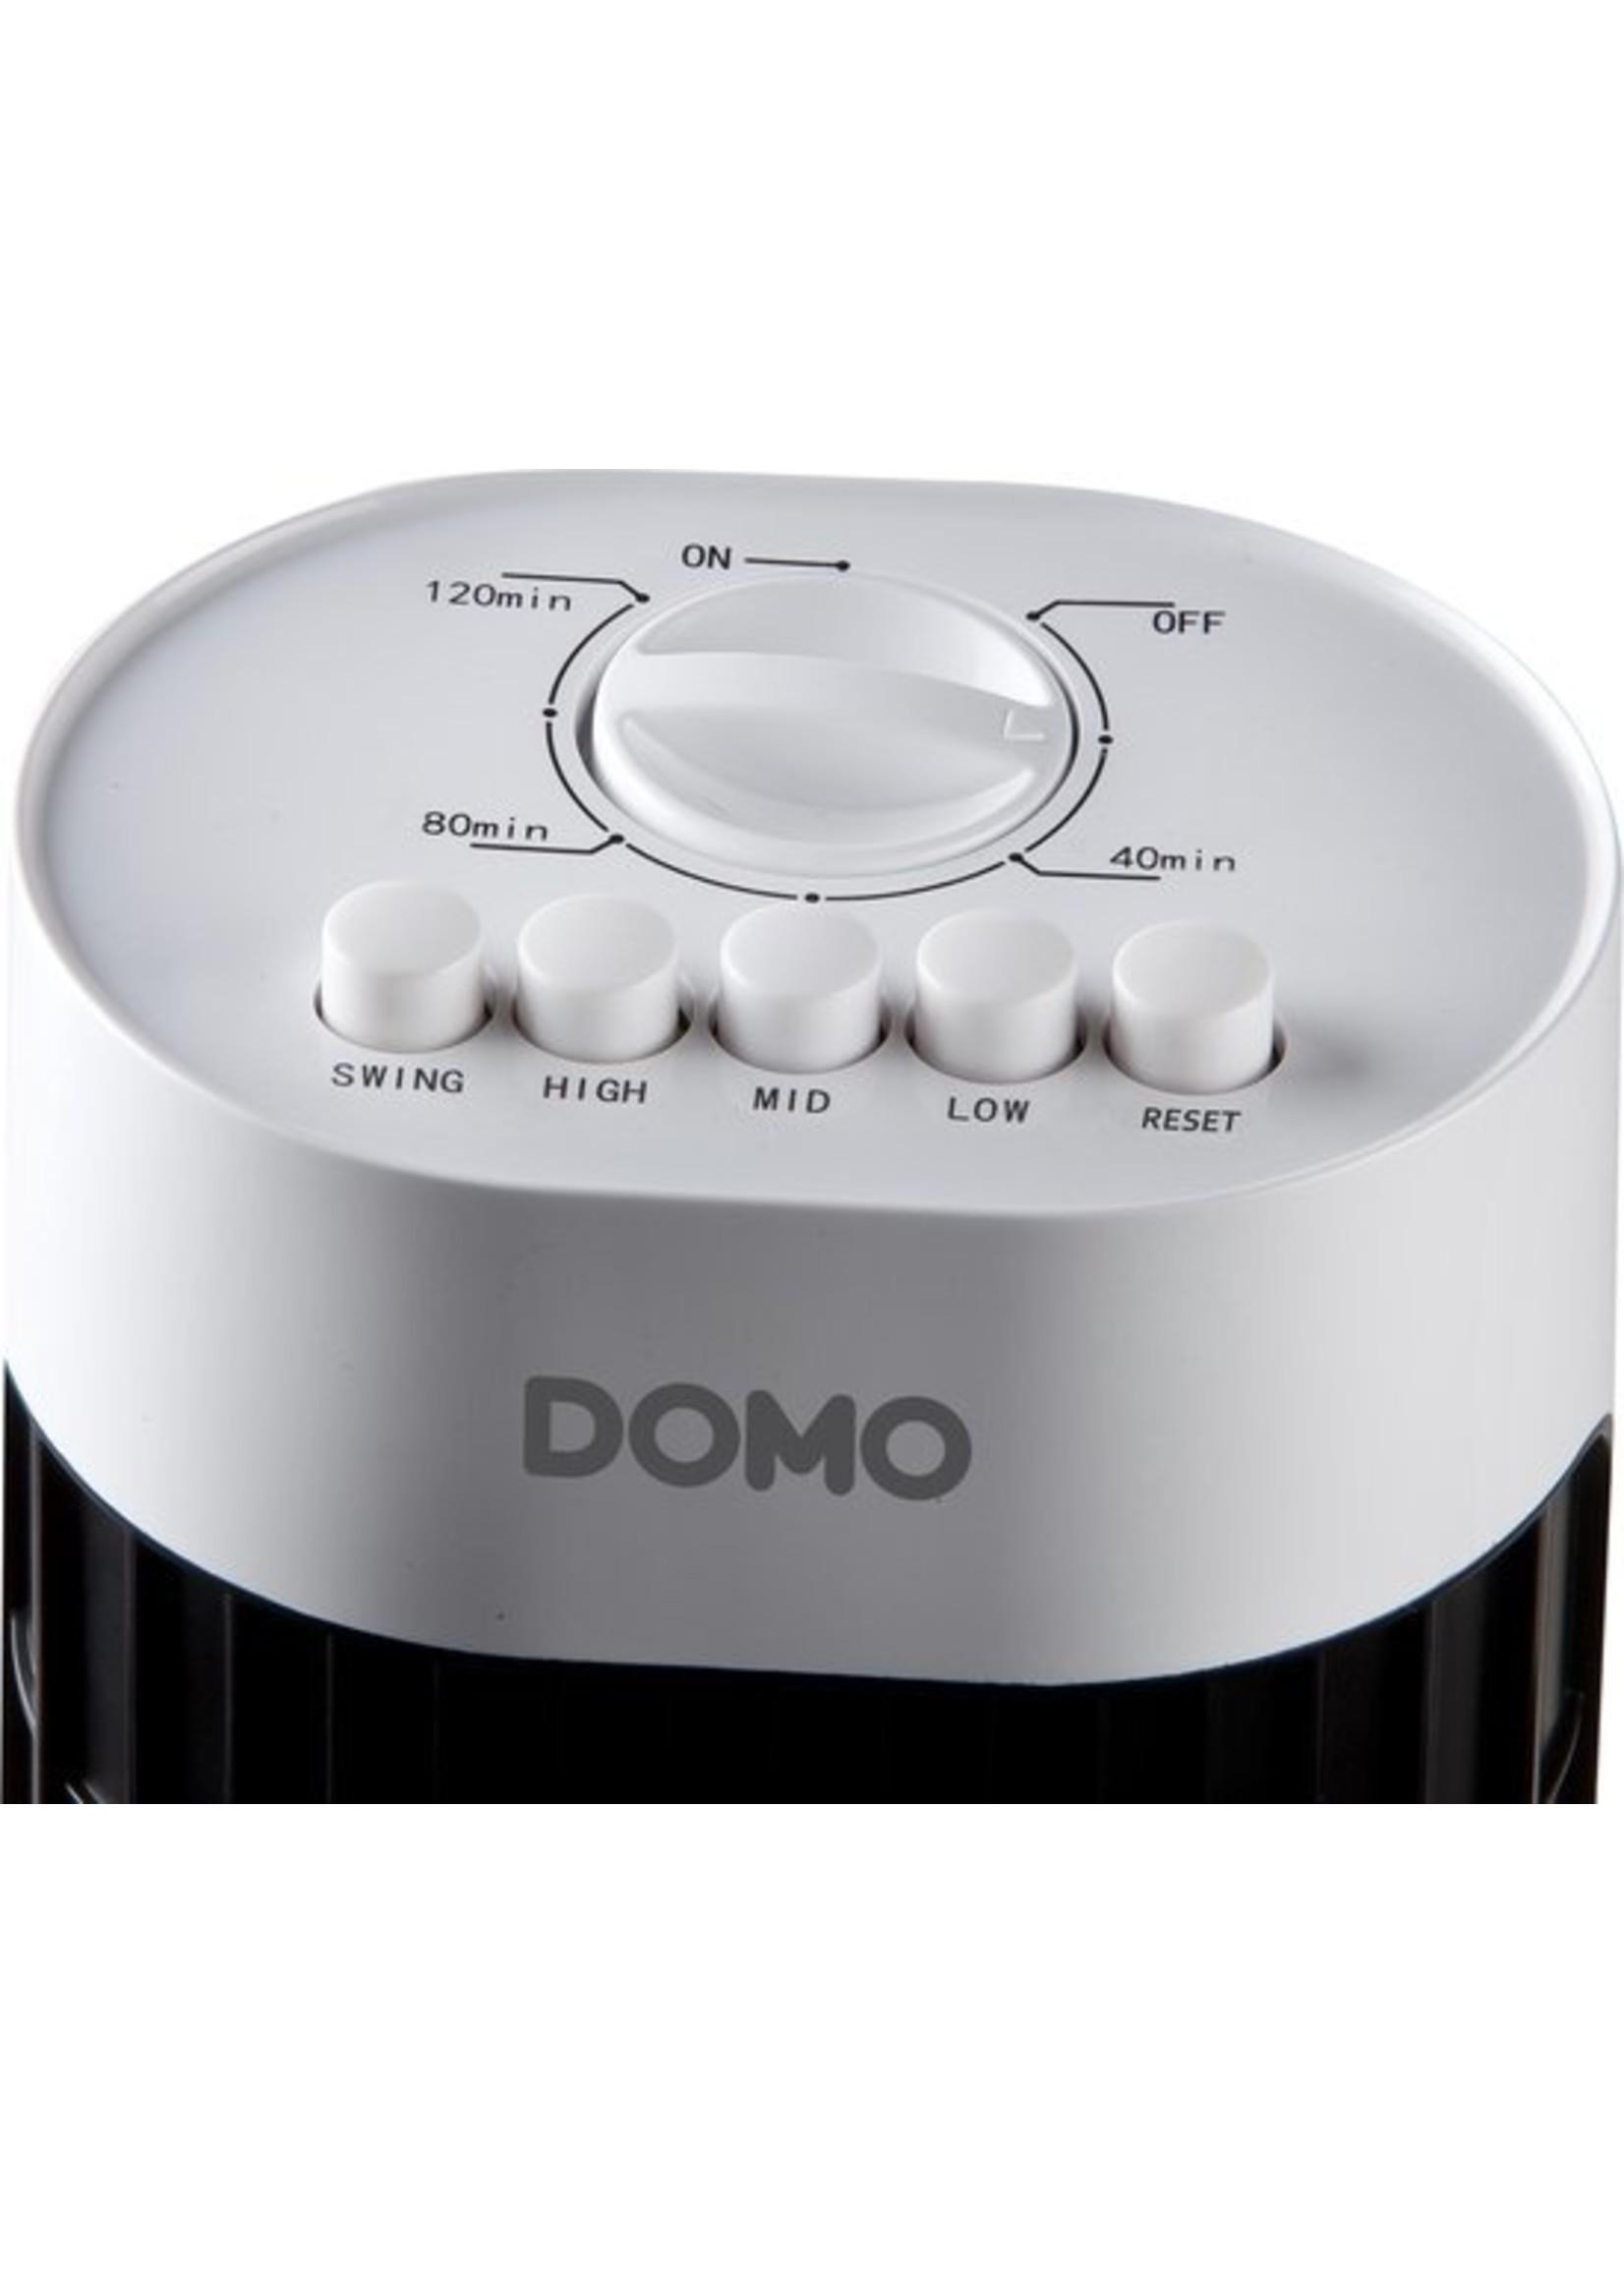 Domo Domo DO8125 Torenventilator Zwart/Wit